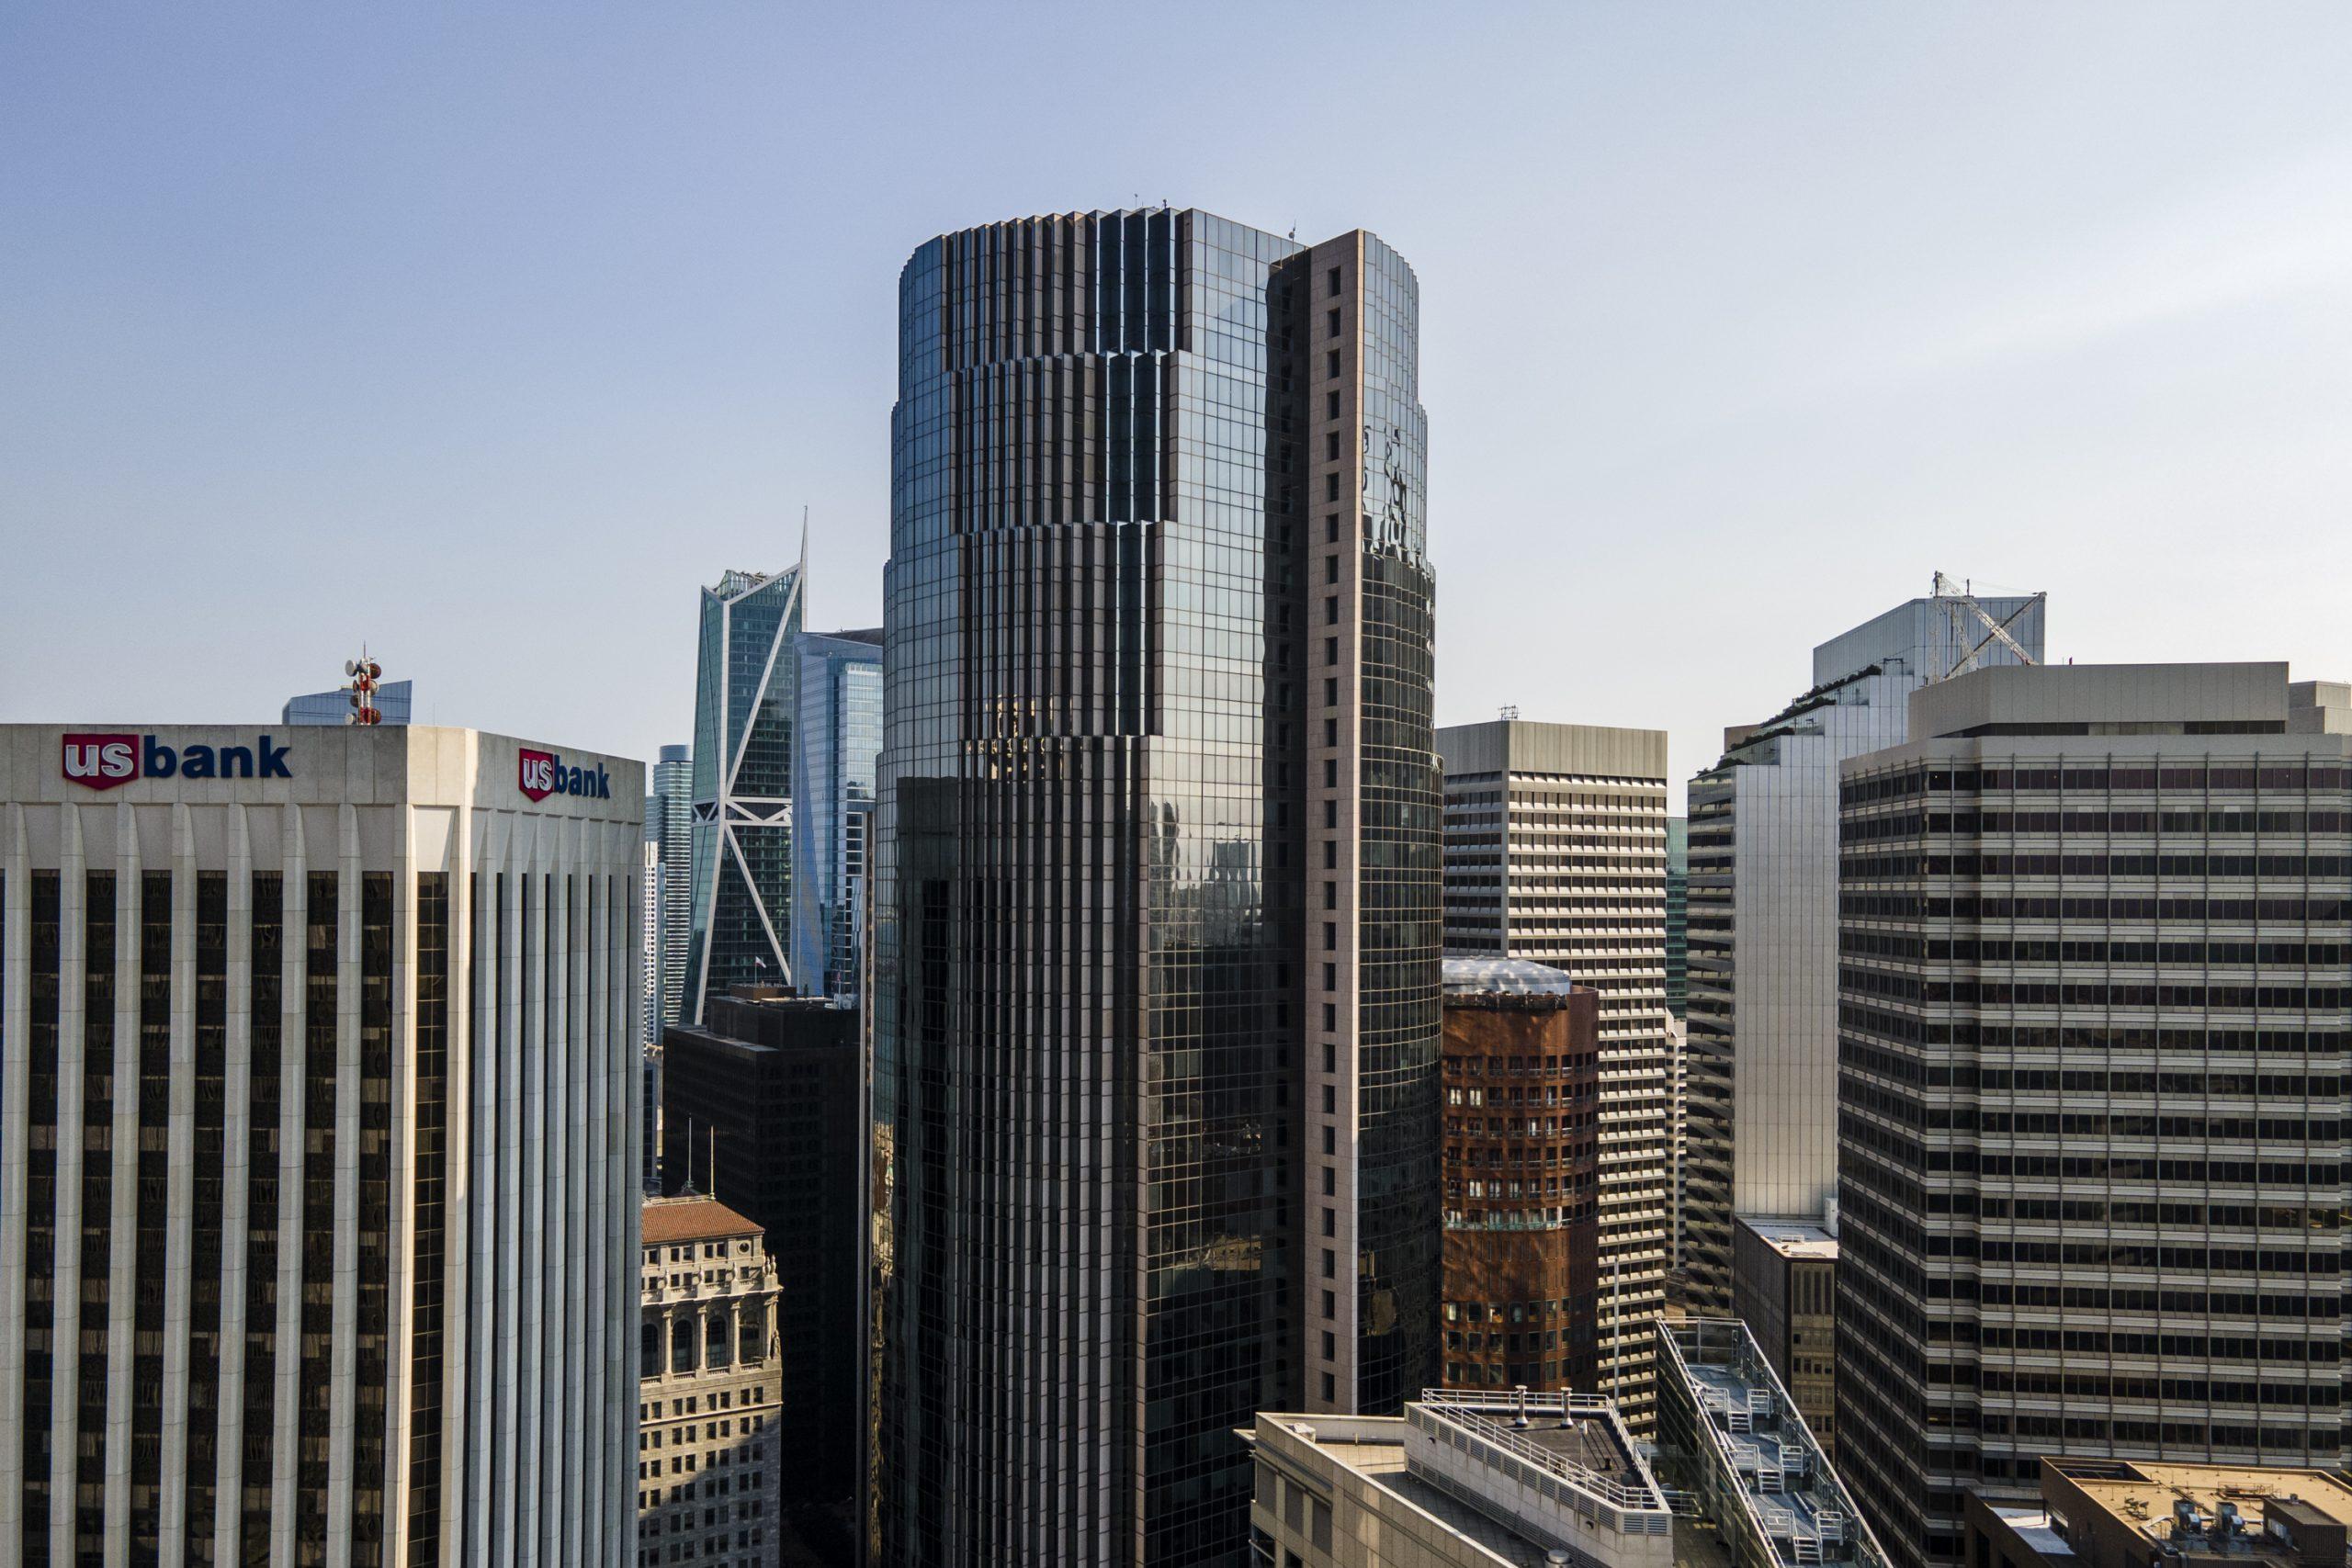 101 California Street aerial view